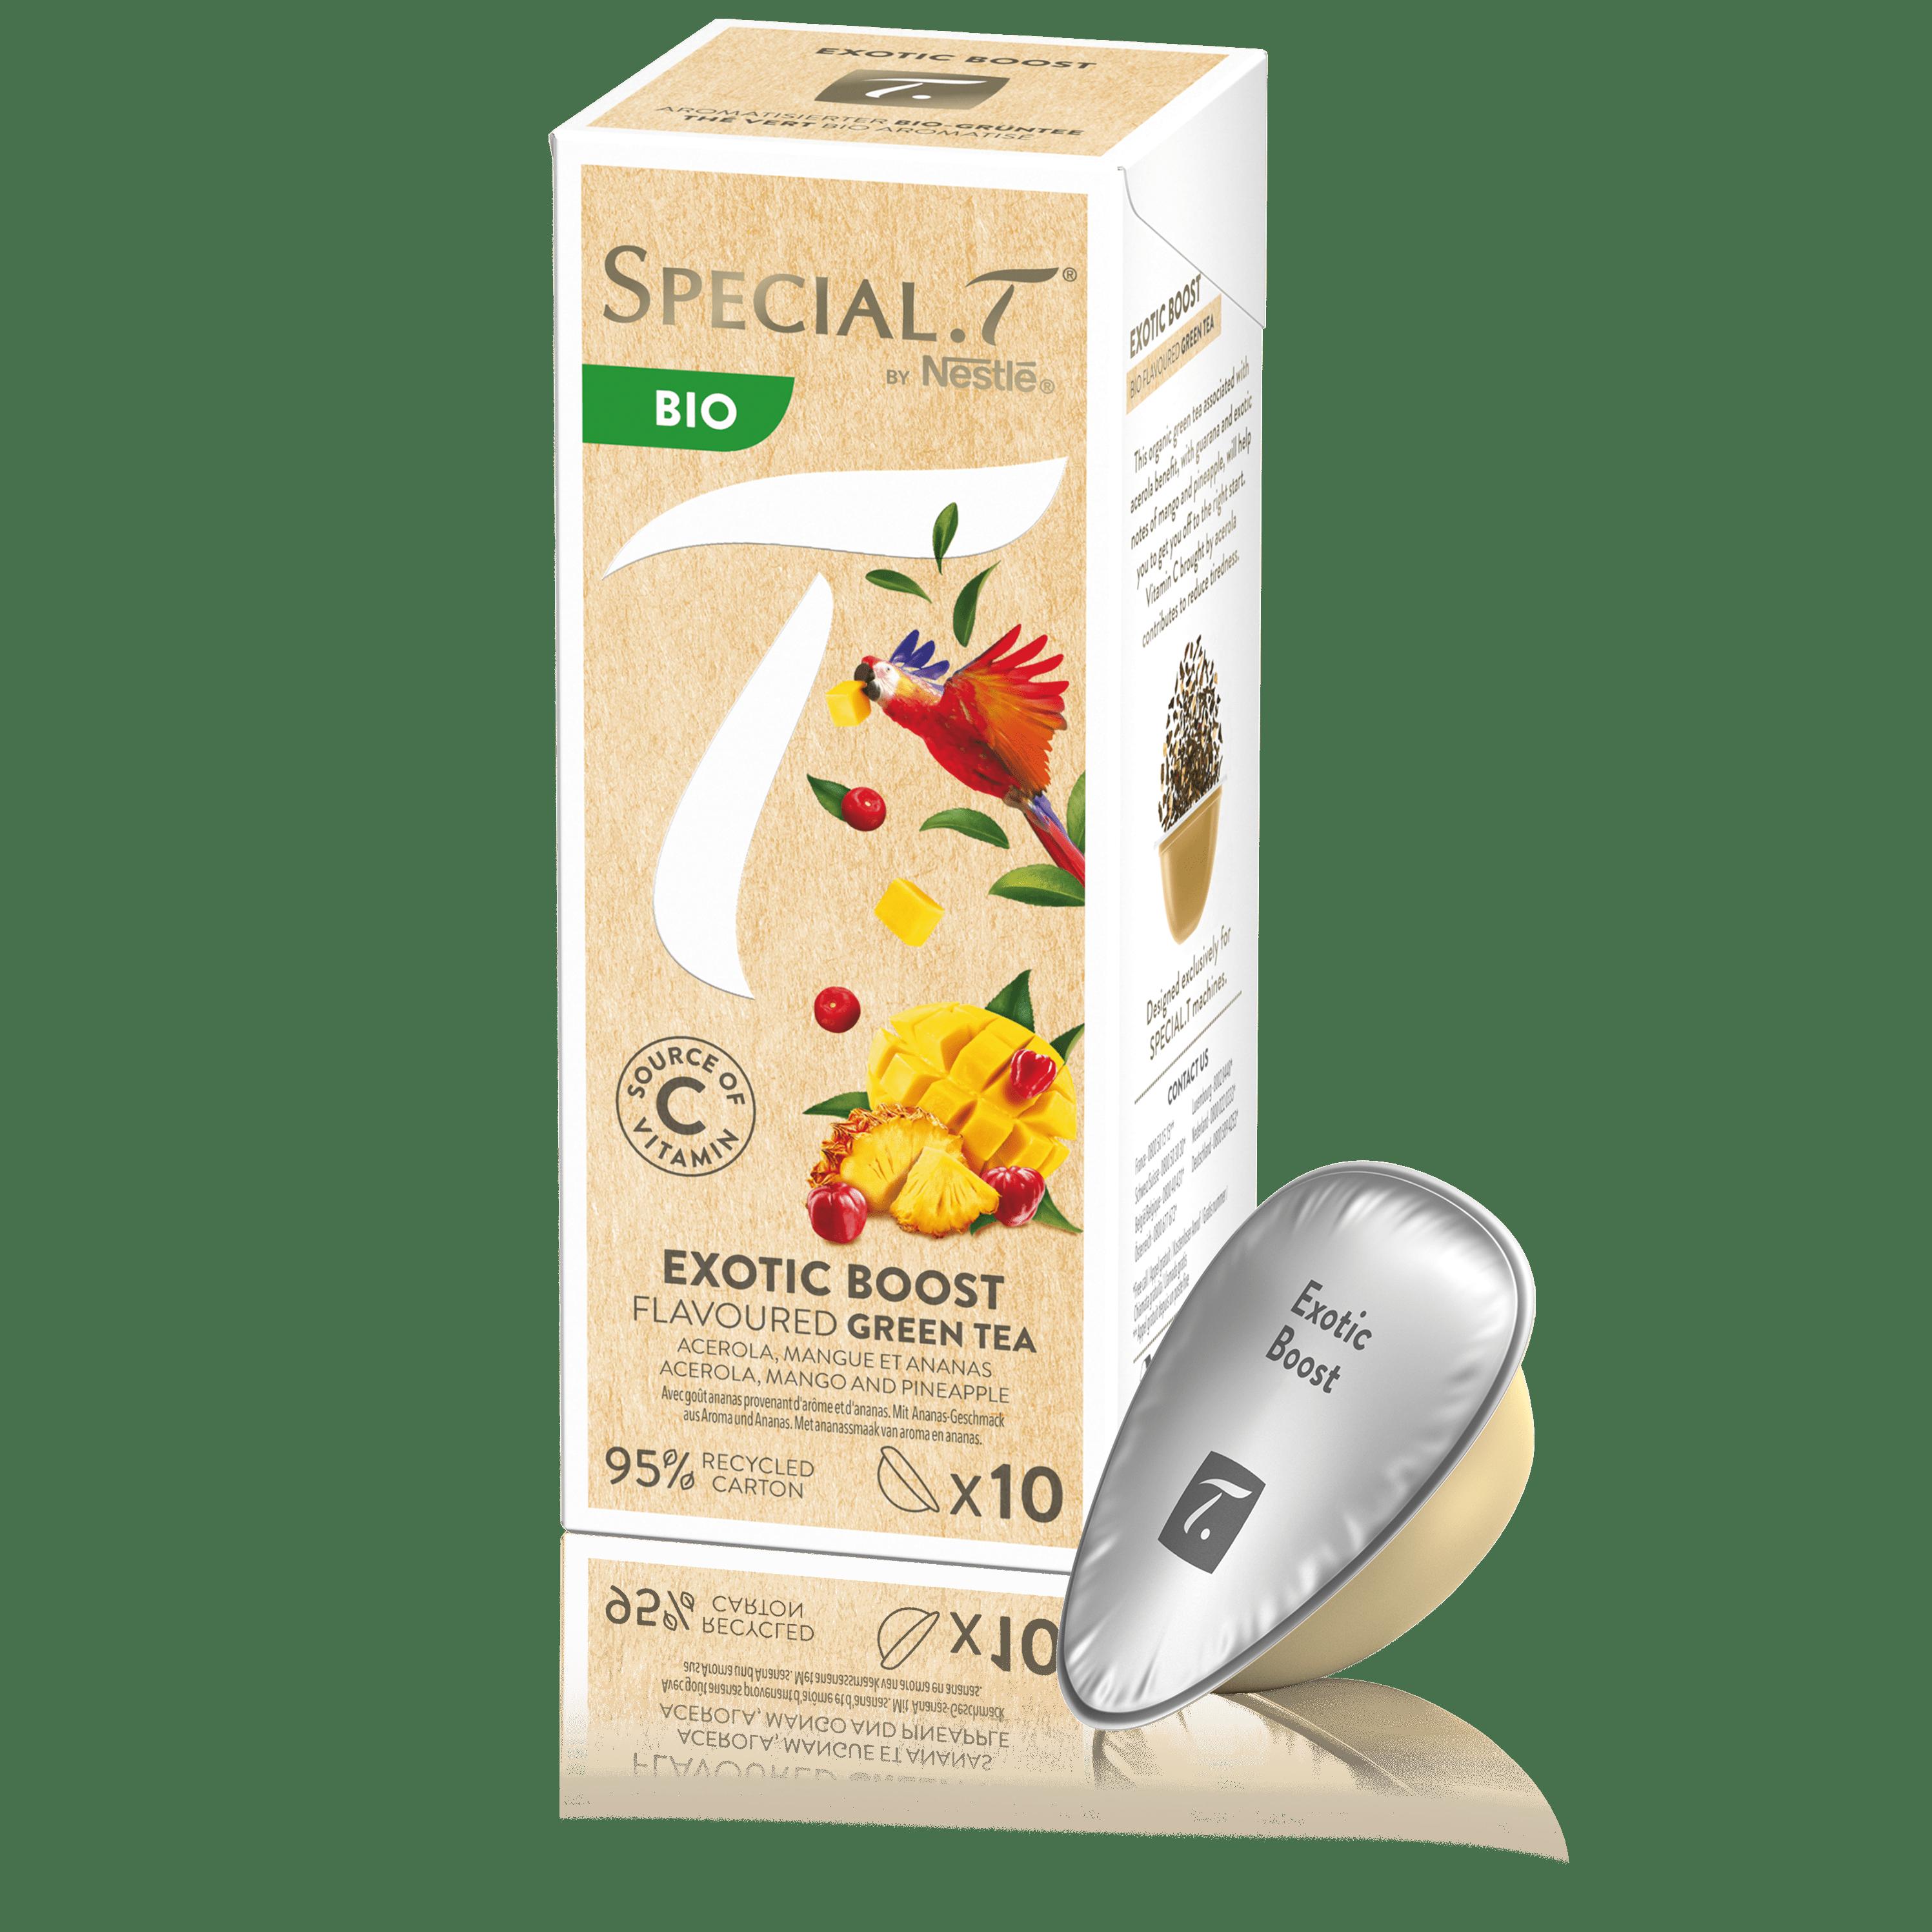 Thé vert - Capsule Exotic Boost bio - Special.T - Kusmi Tea